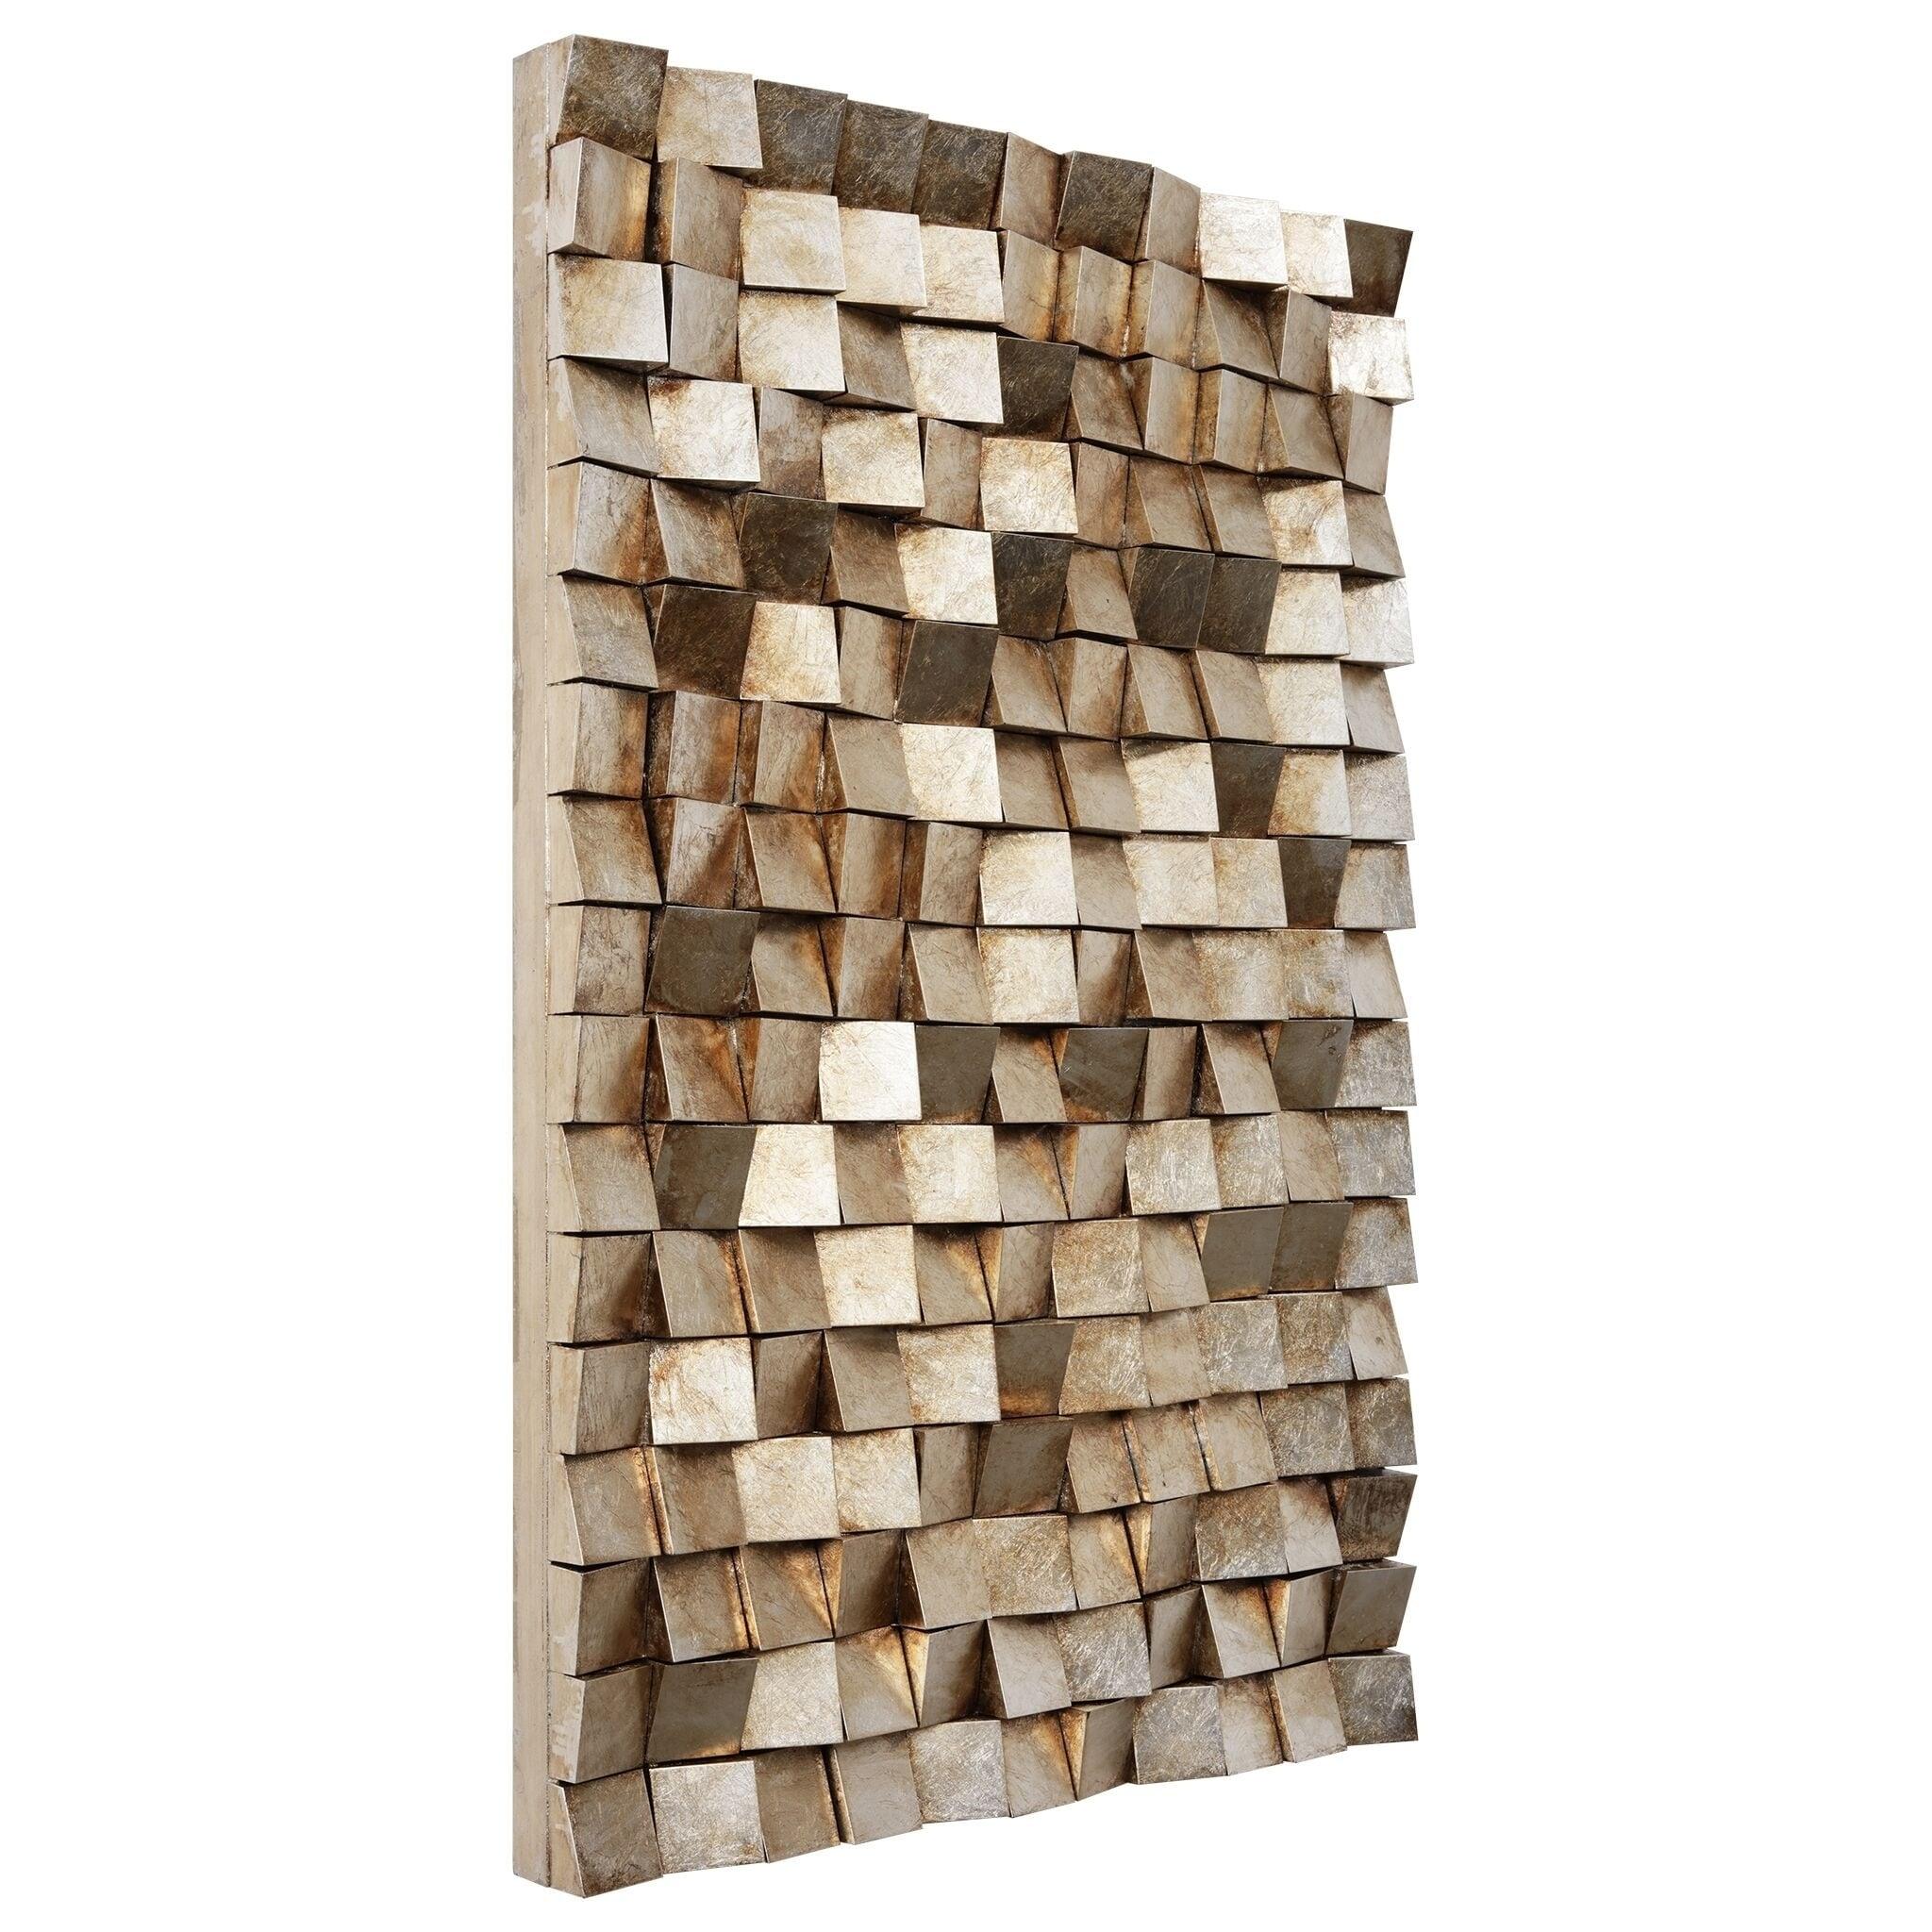 Textured 1 Metallic Handed Painted Rugged Wooden Blocks Wall Art